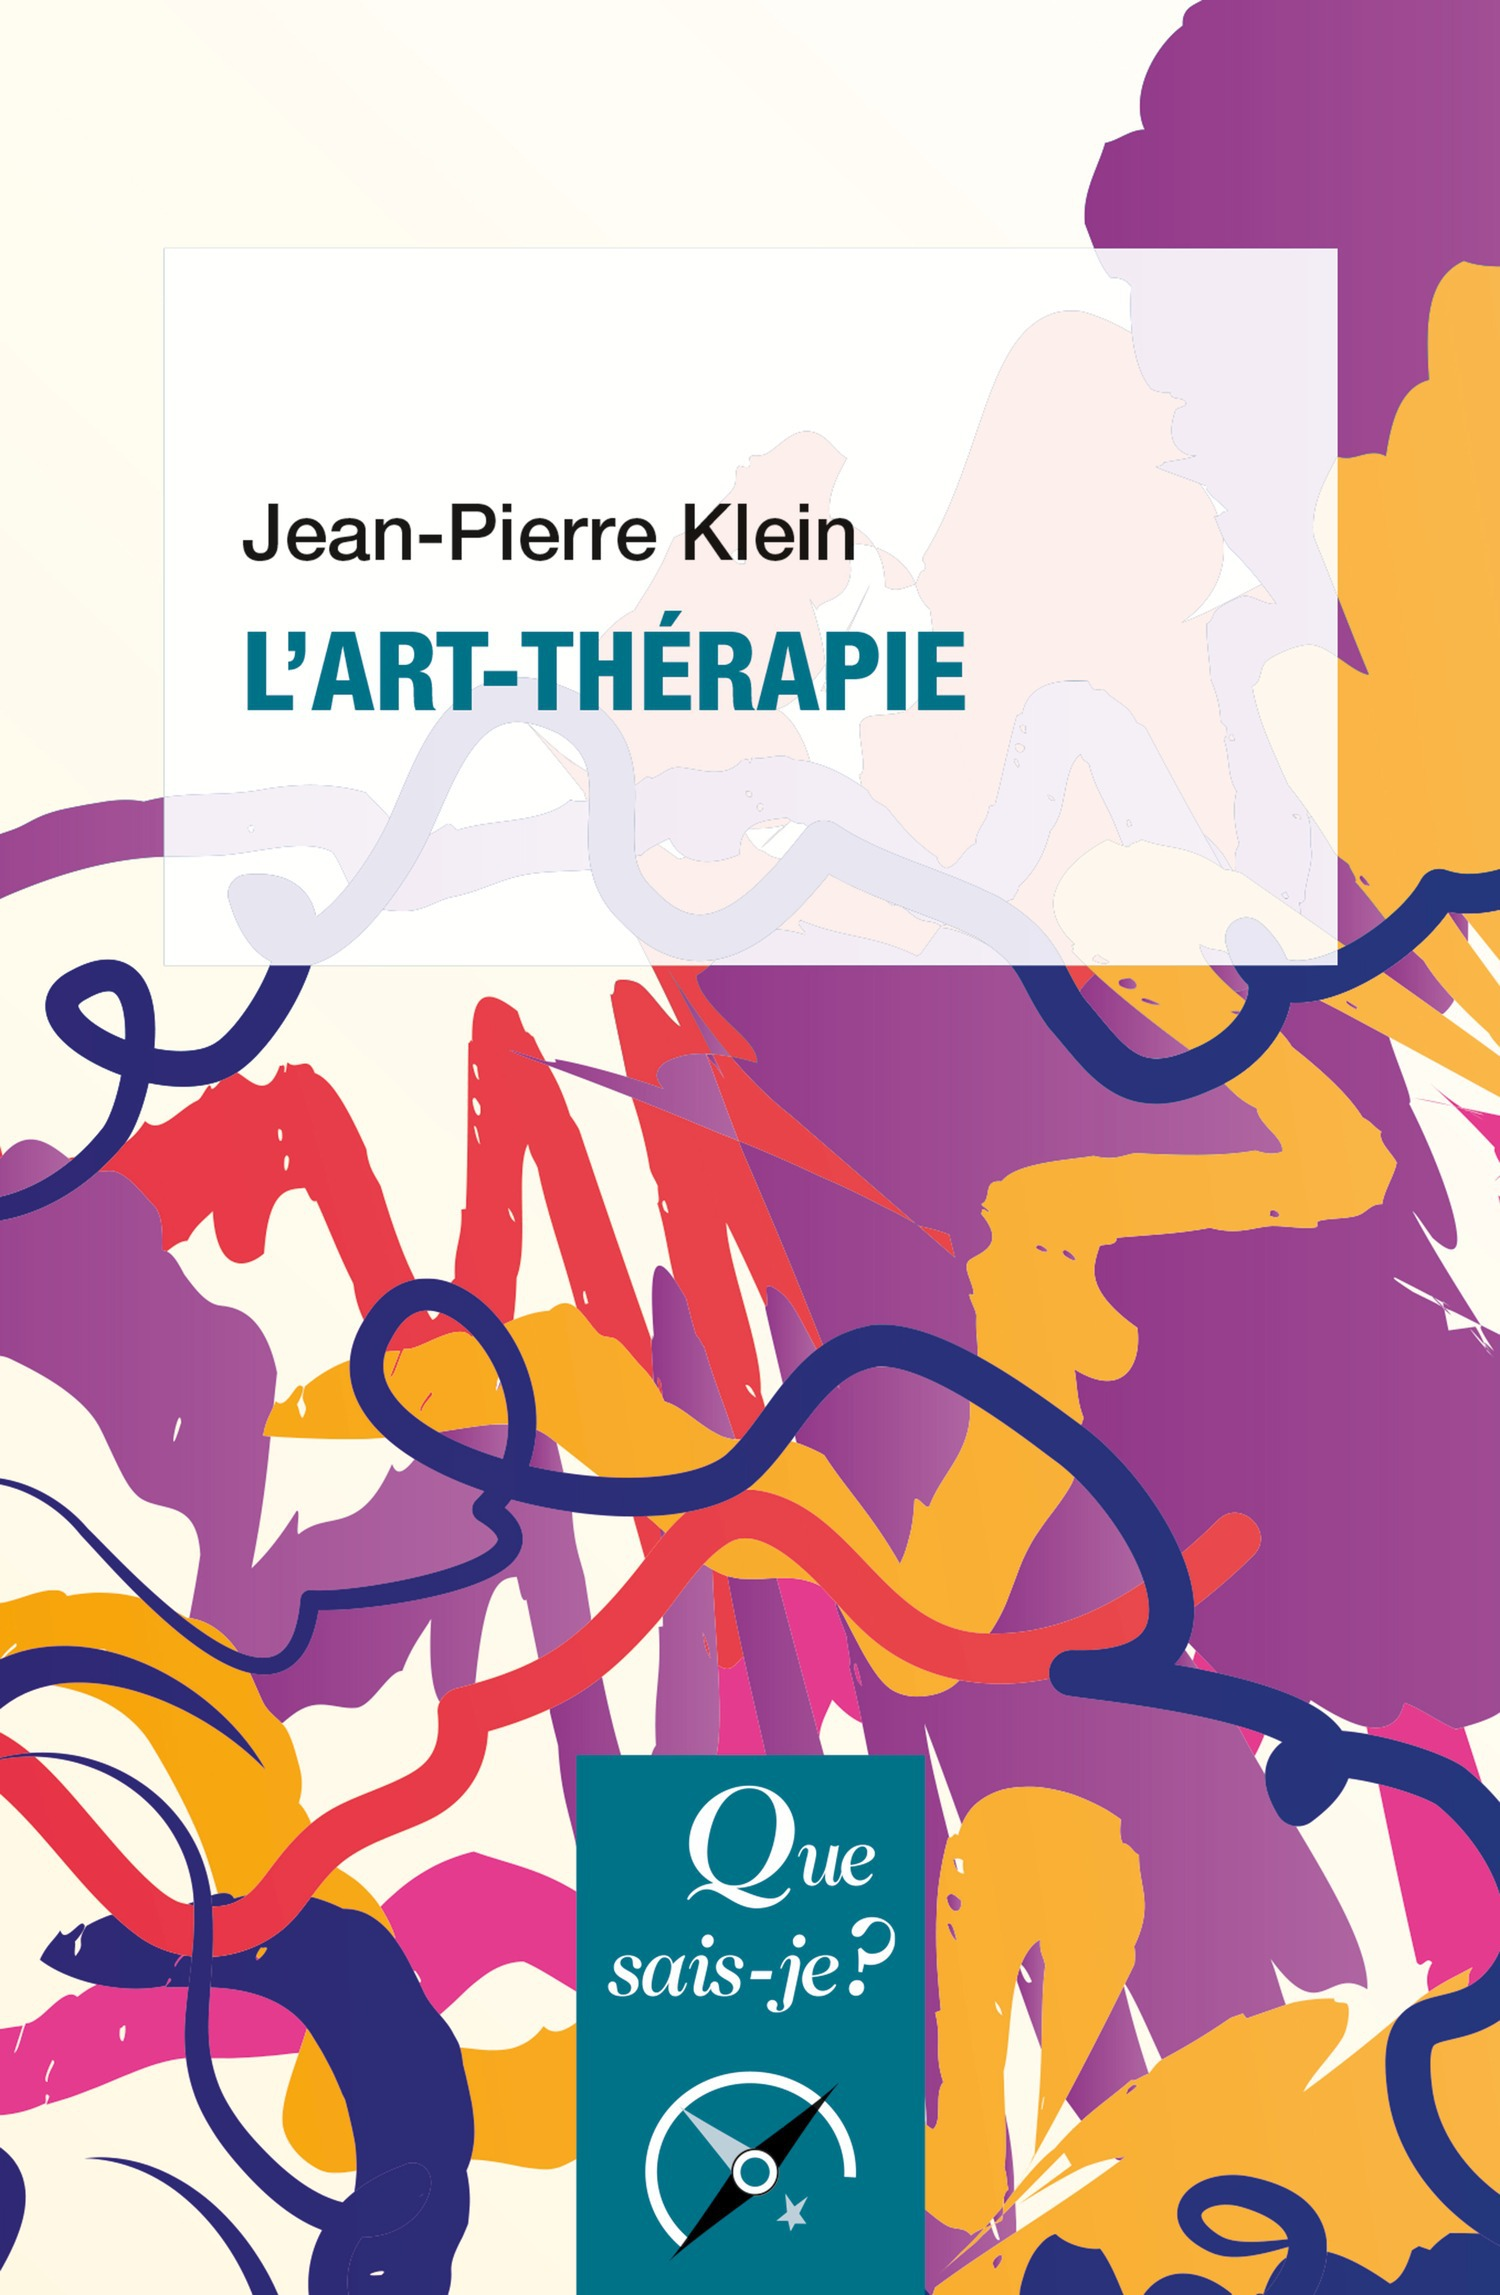 Jean-Pierre Klein L'art-thérapie